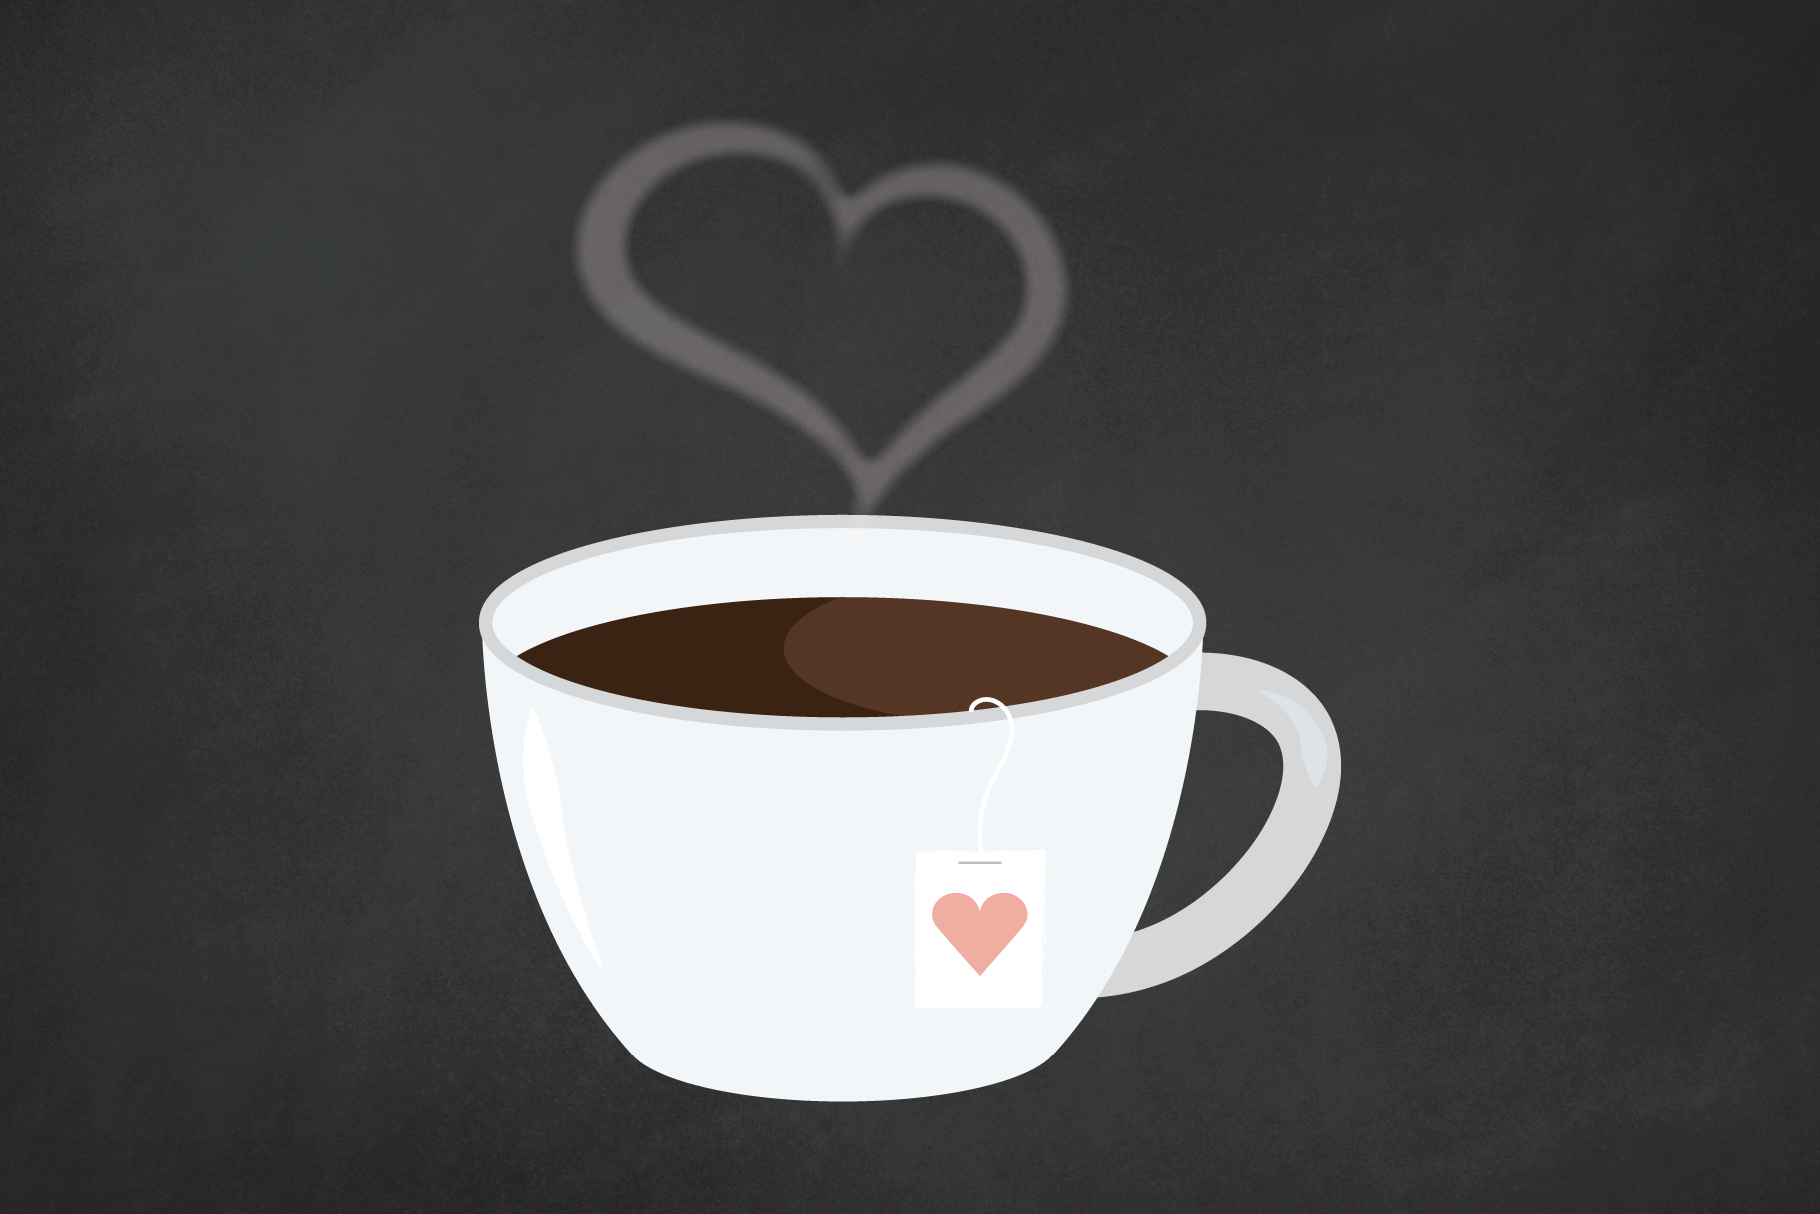 Heart Steam Tea Mug Clip Art Set By Running With Foxes Thehungryjpeg Com